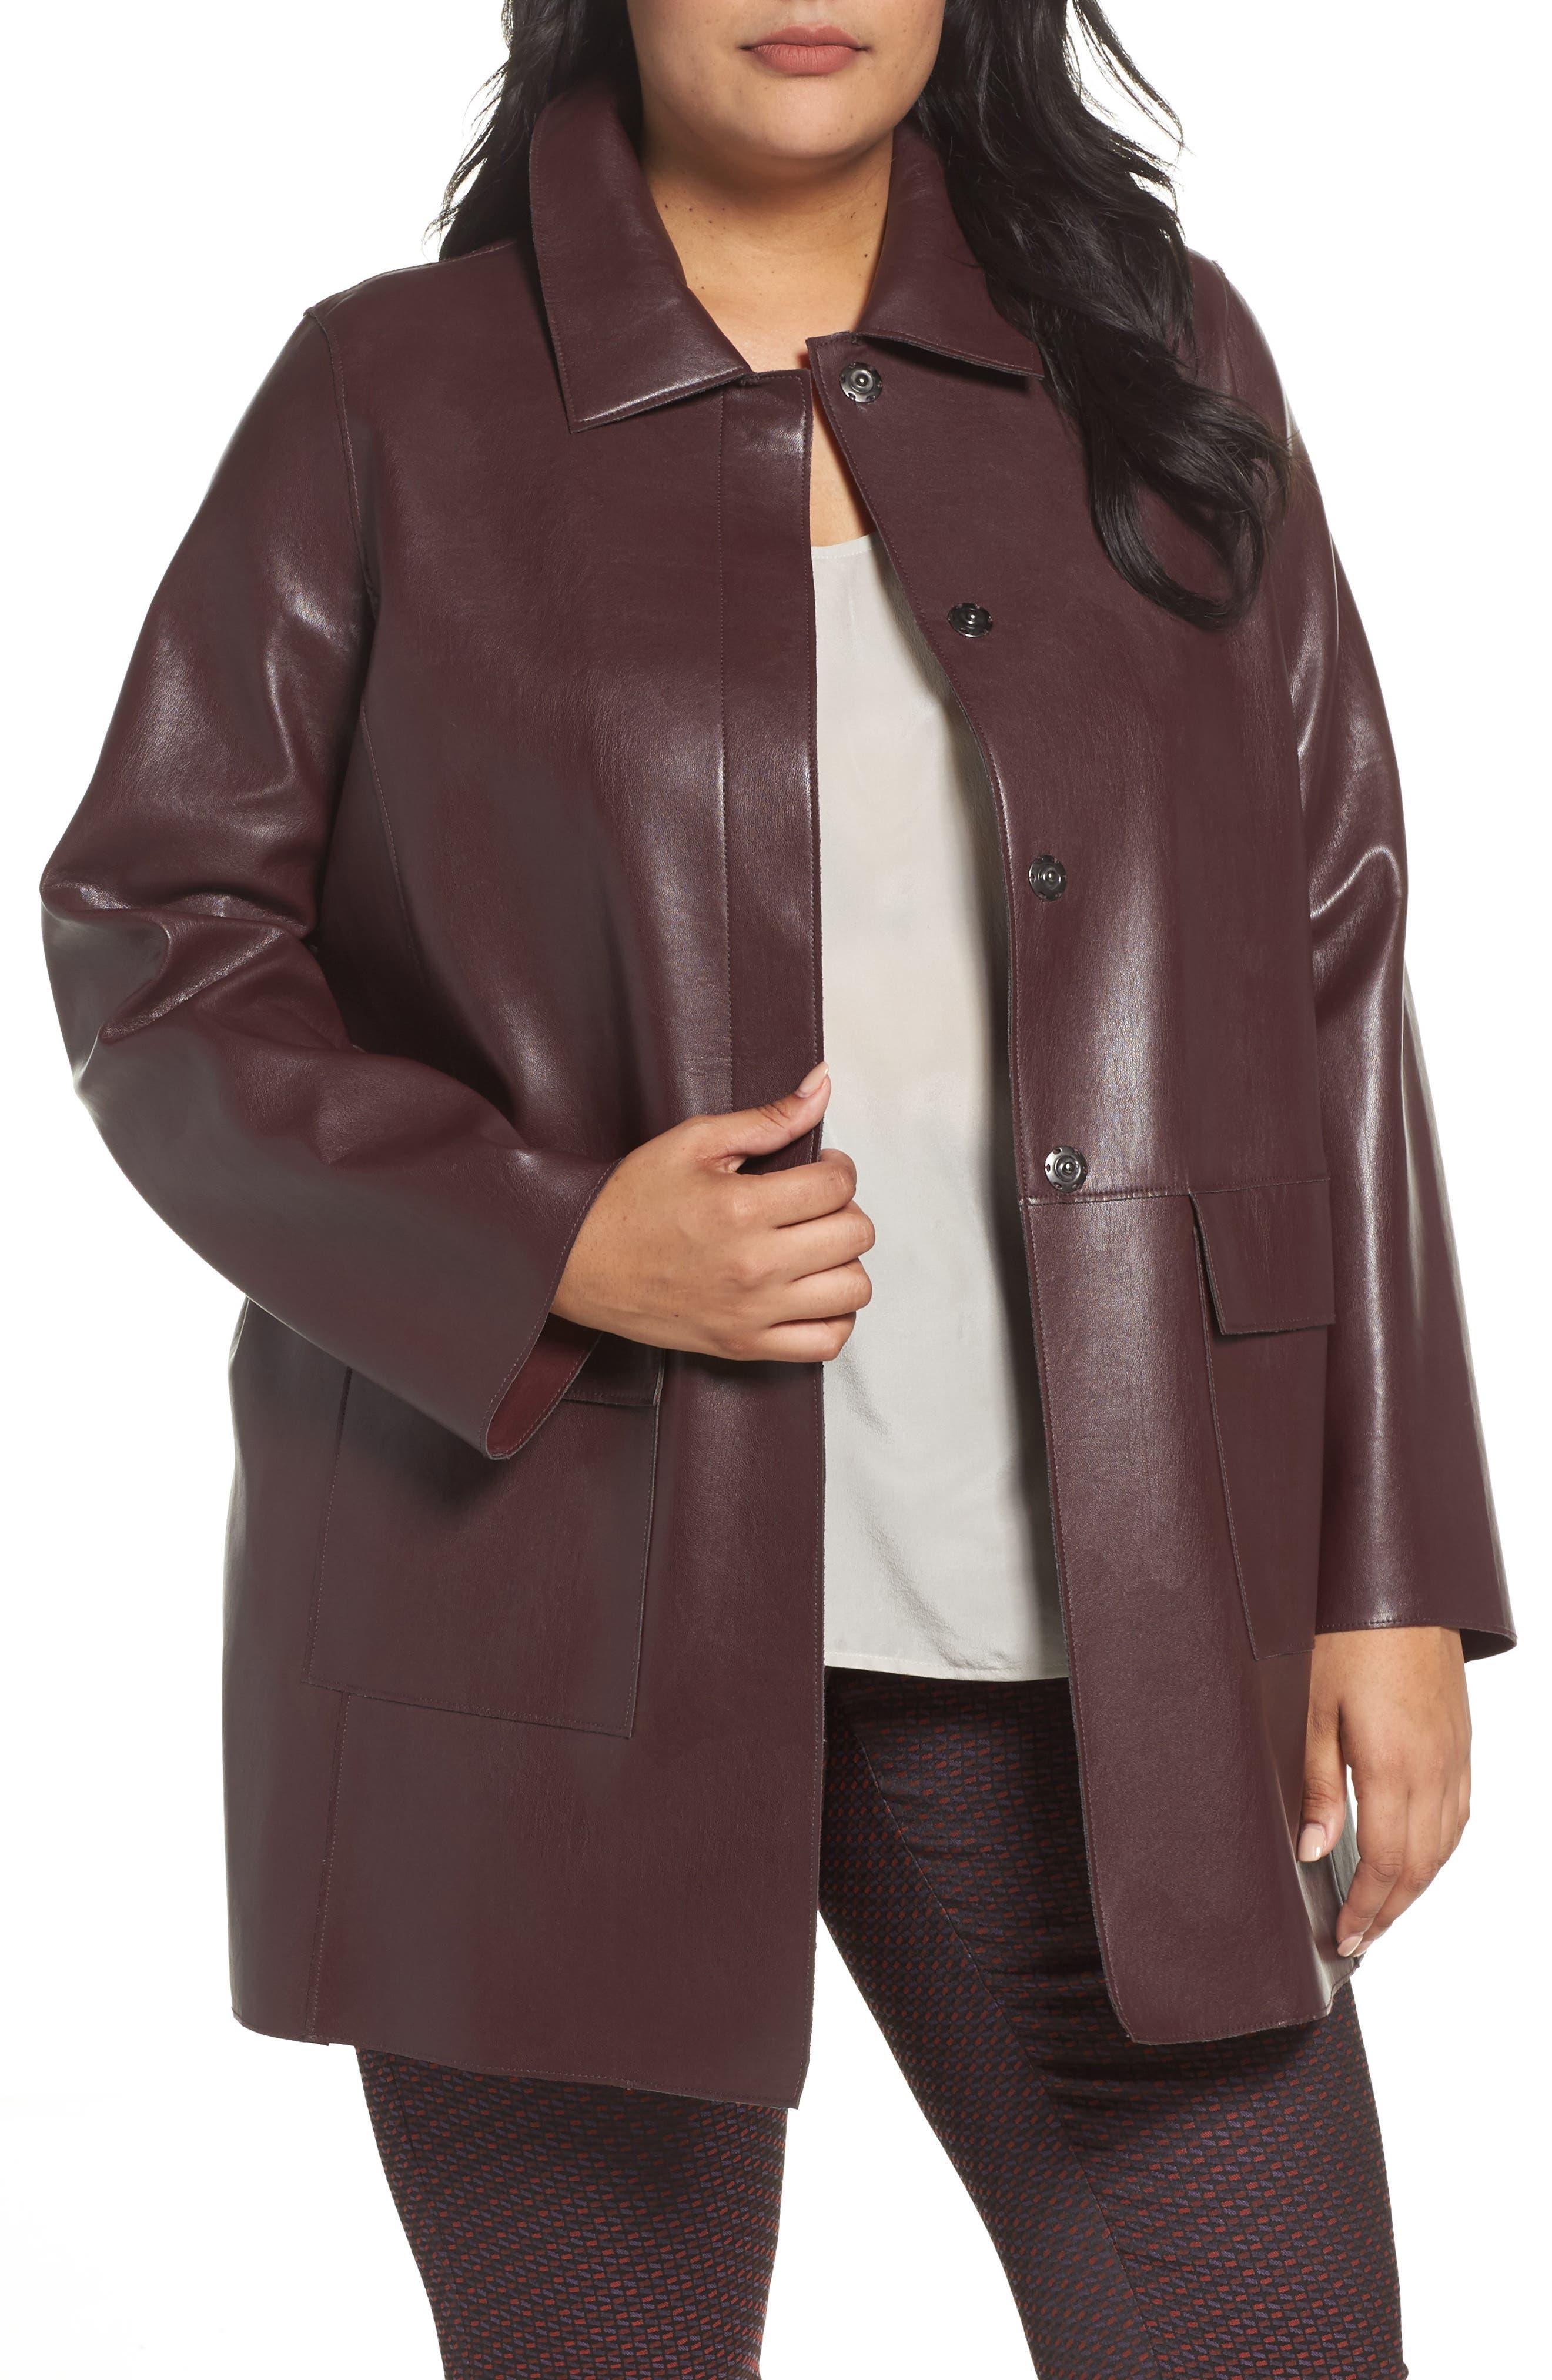 Main Image - Persona by Marina Rinaldi Narrare Faux Leather Coat (Plus Size)